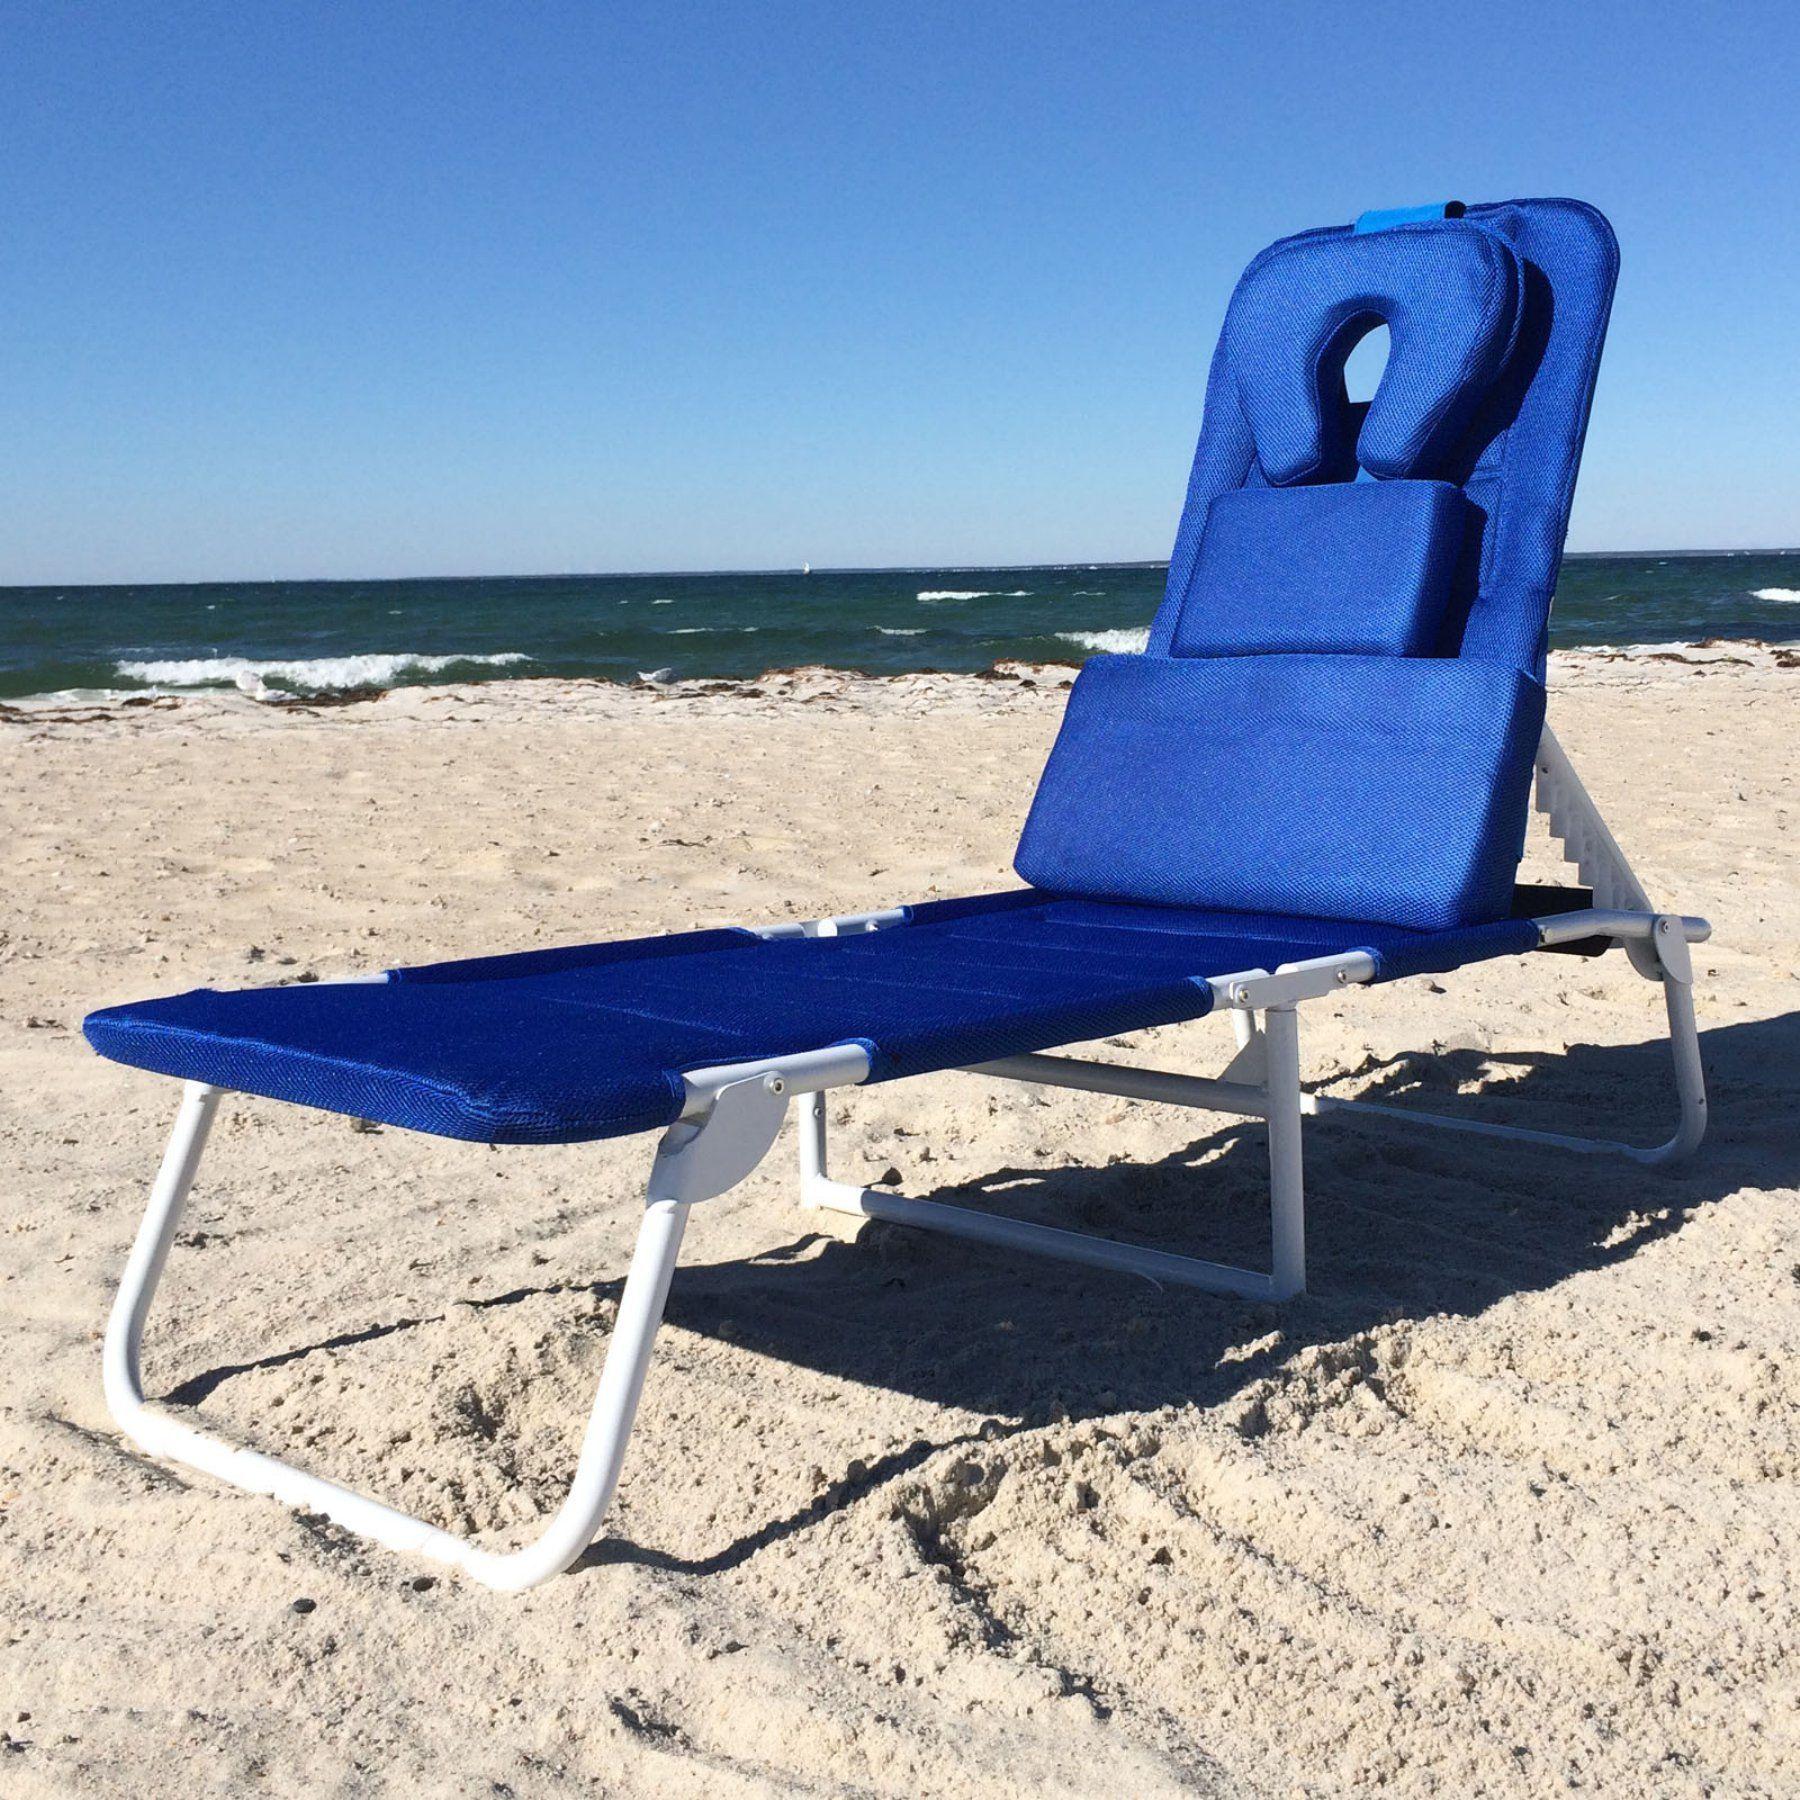 Outdoor Ergo Lounger Cloud Chaise Lounge 14270 Lounger